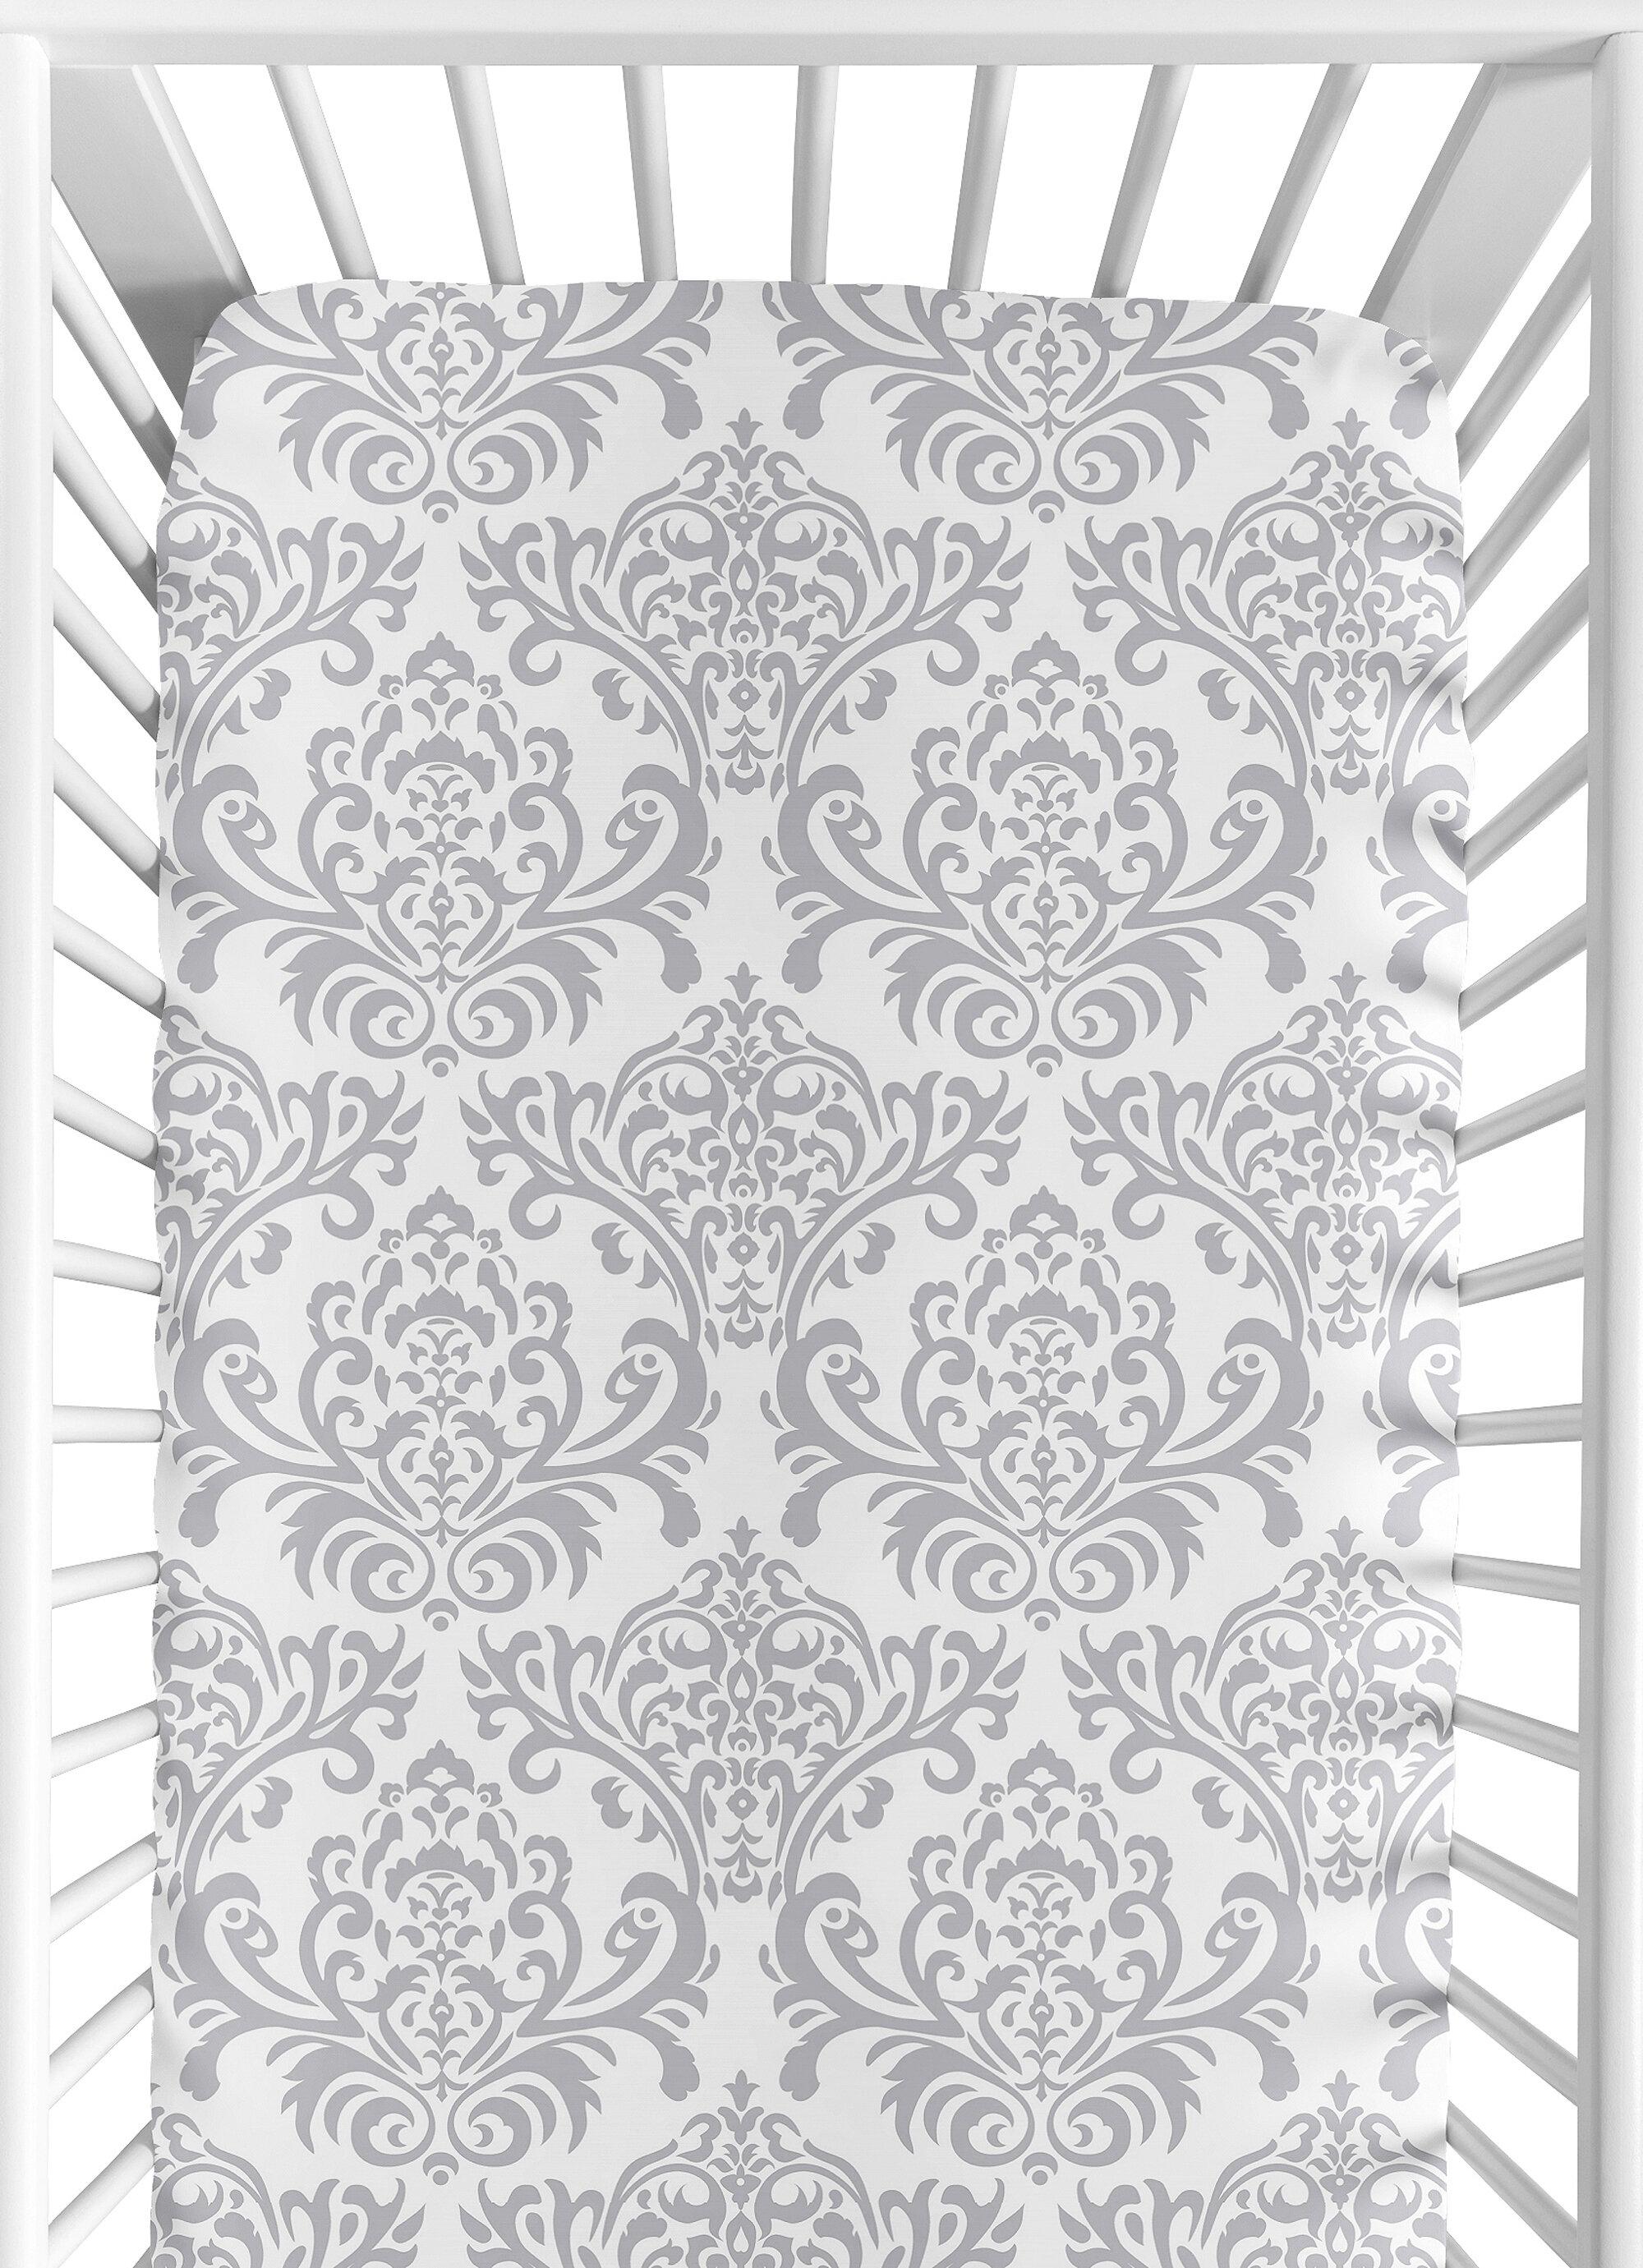 100/% Cotton Sateen Floral Design Grey Damask Fitted Crib Toddler Sheet